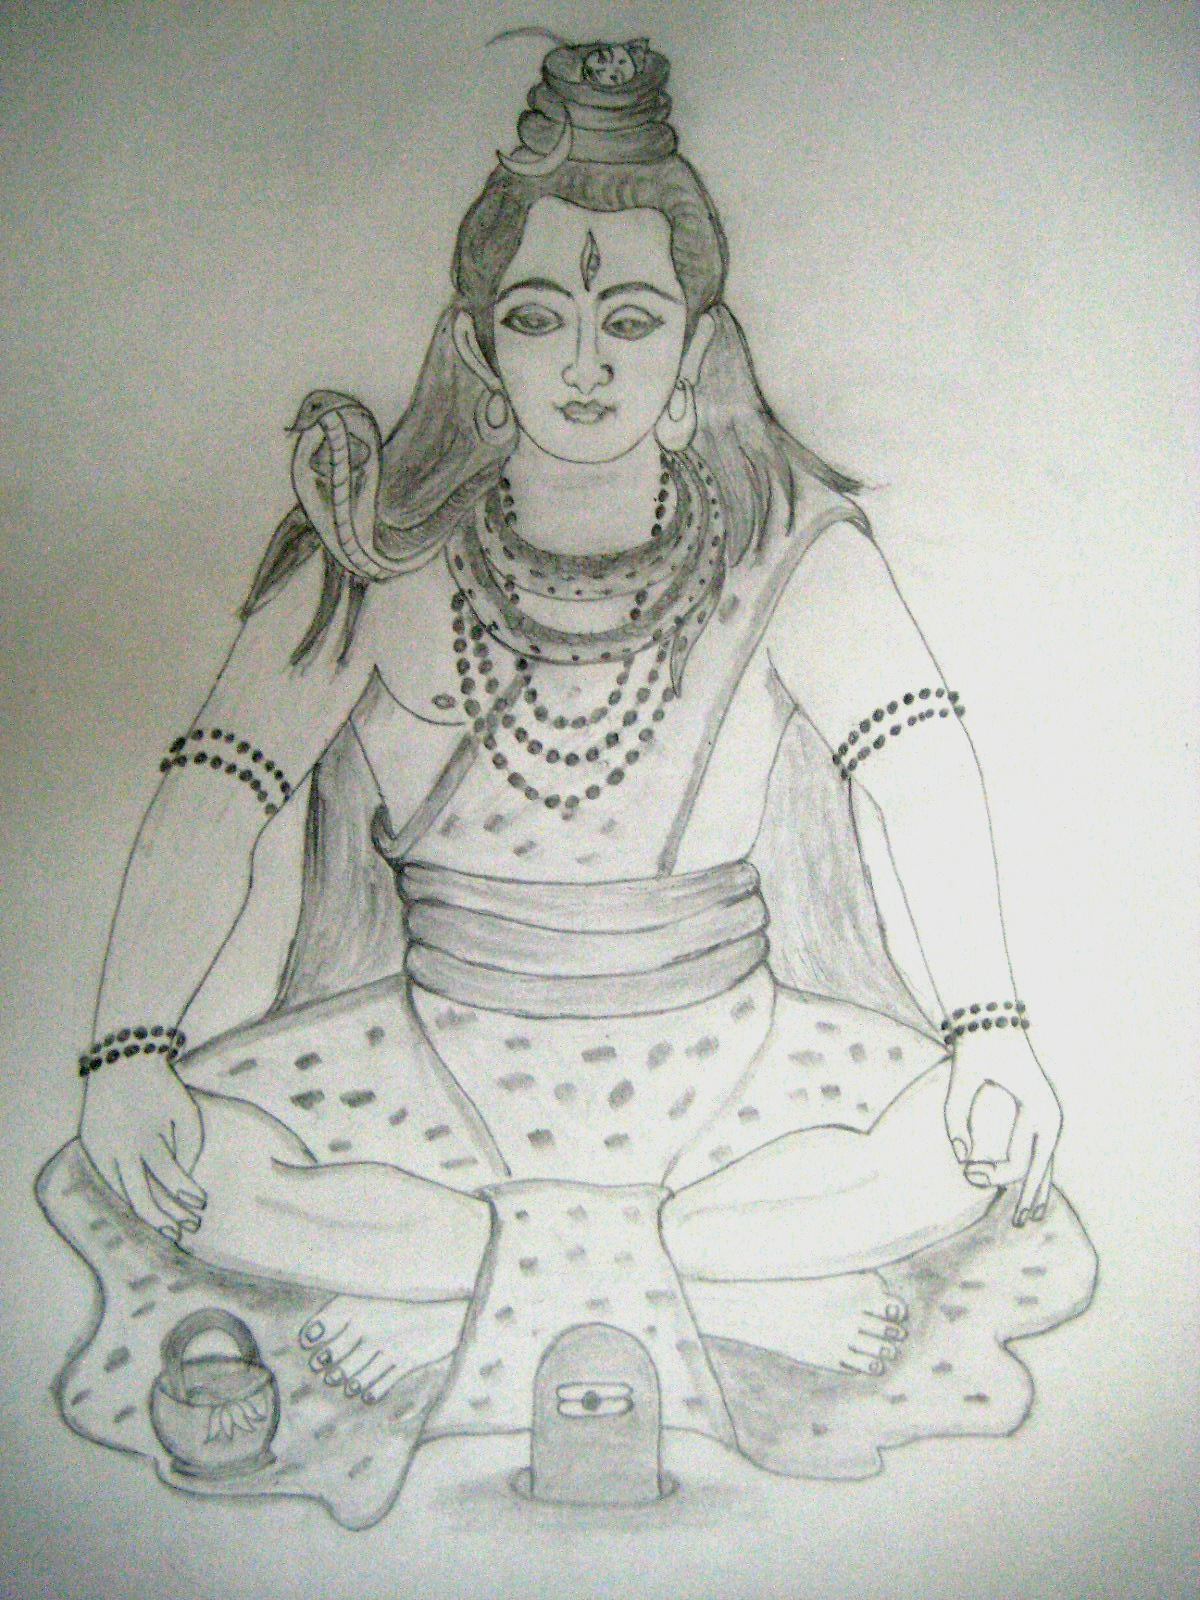 Lord shiva in meditation